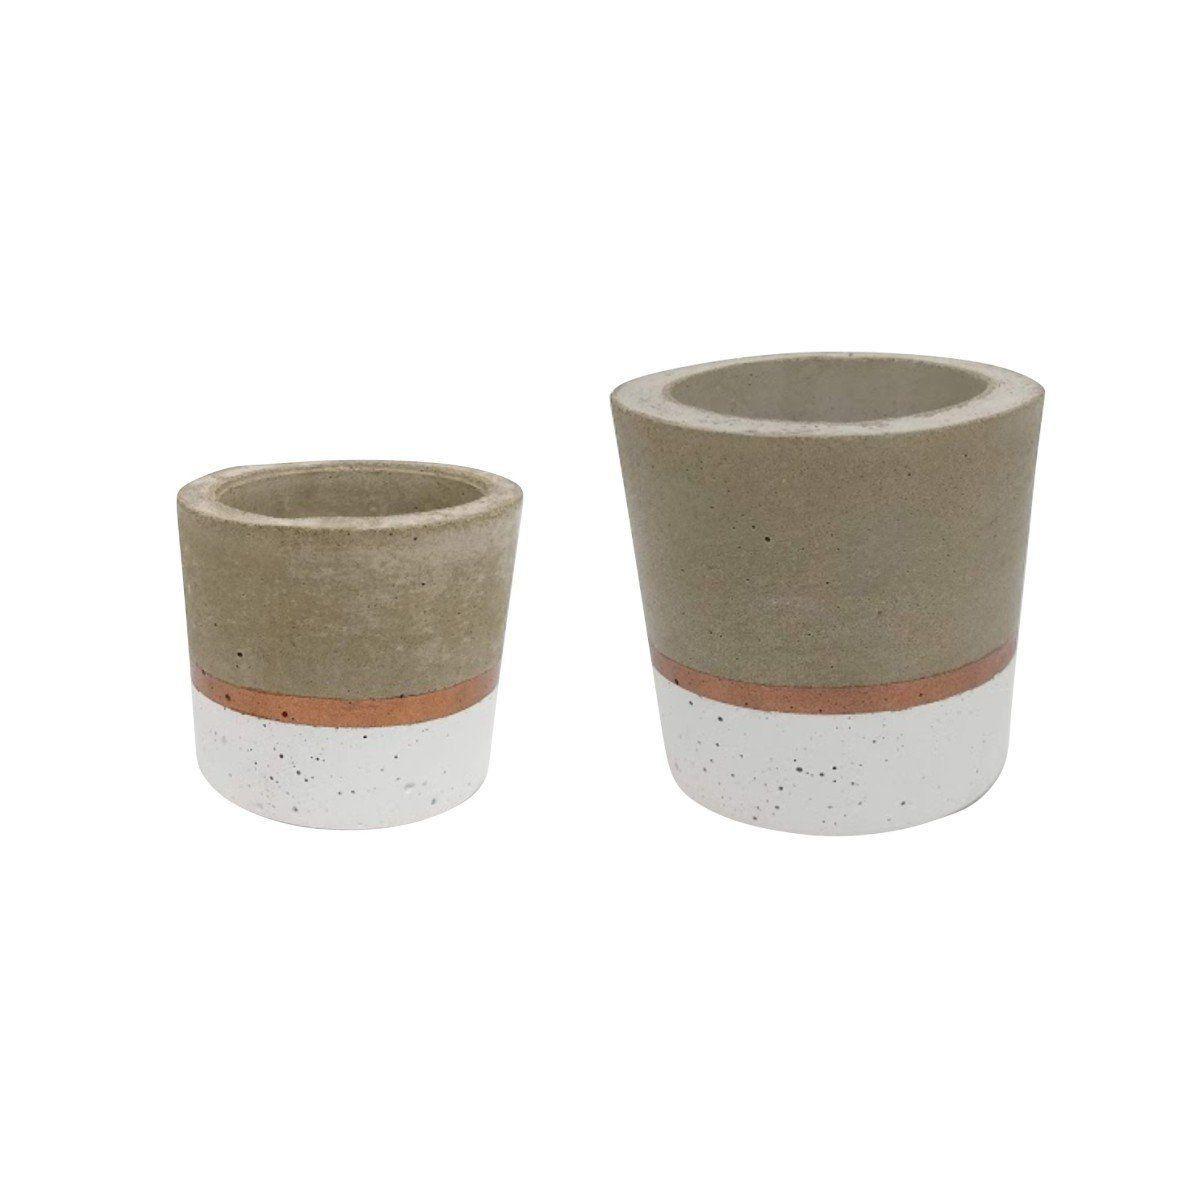 Kit 2 vasos de cimento MD1815BC